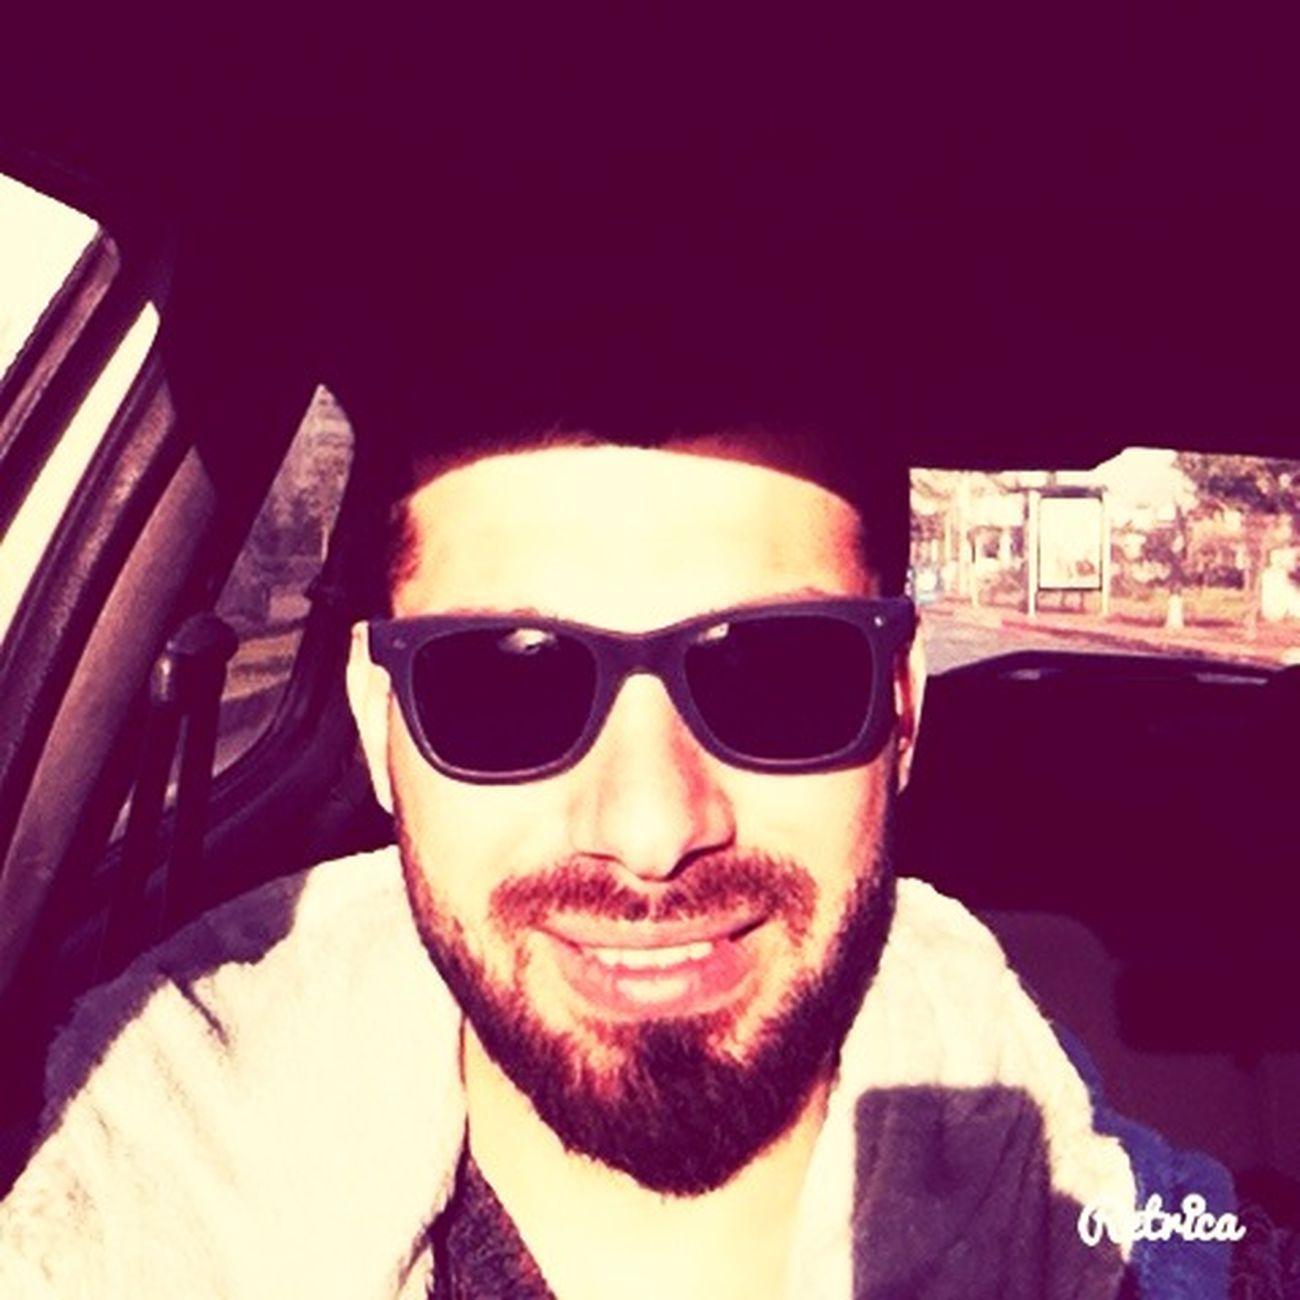 🌞🌞☁☁⛅⛅ Antalya Turkey Güzel Bir Gün